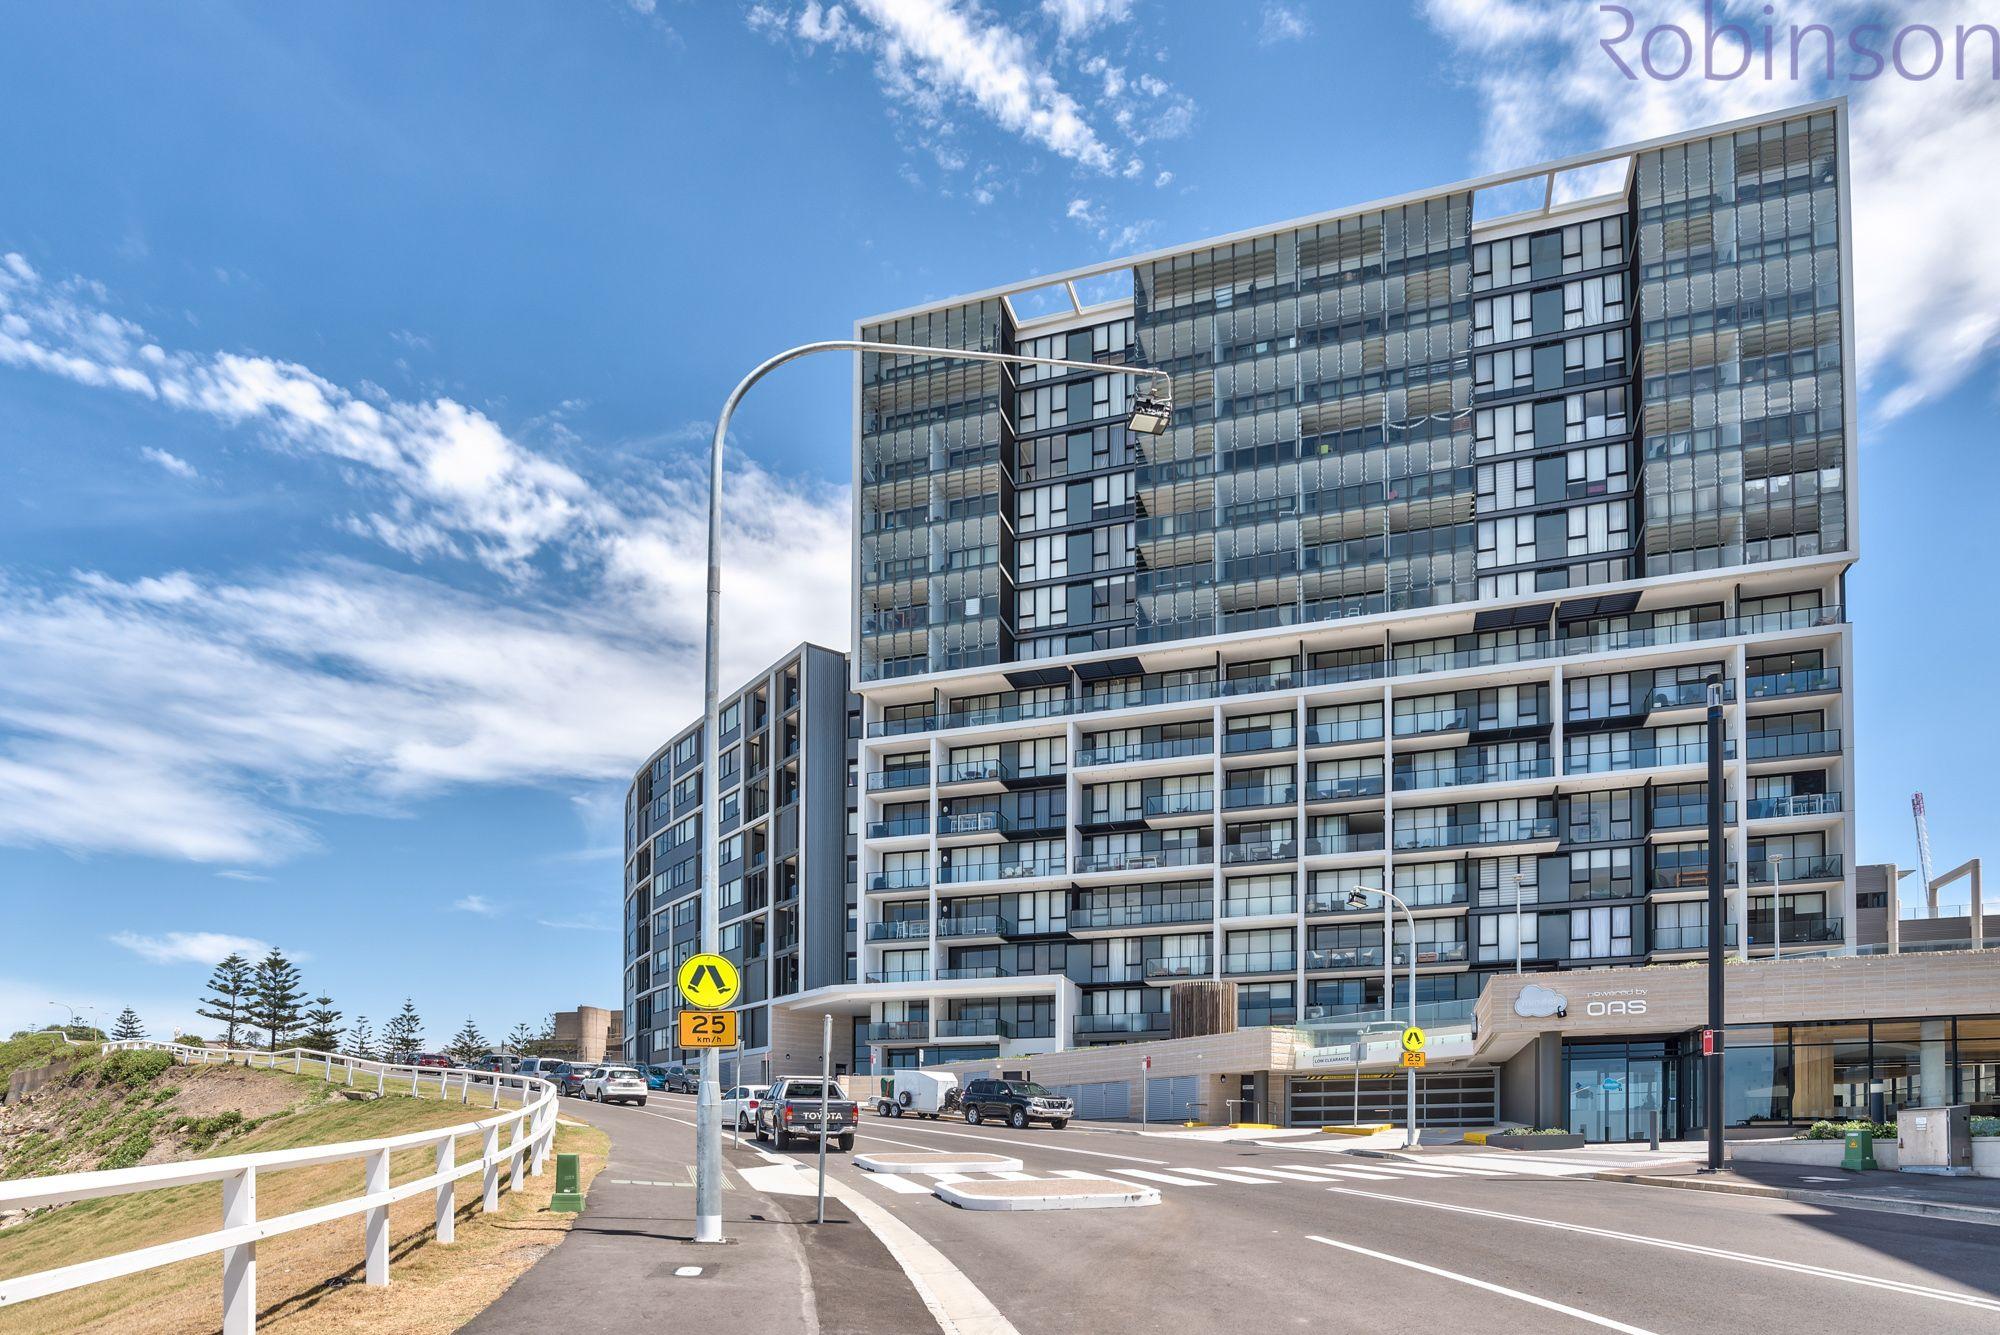 Level 14/B1406/75 Shortland Esplanade, Newcastle